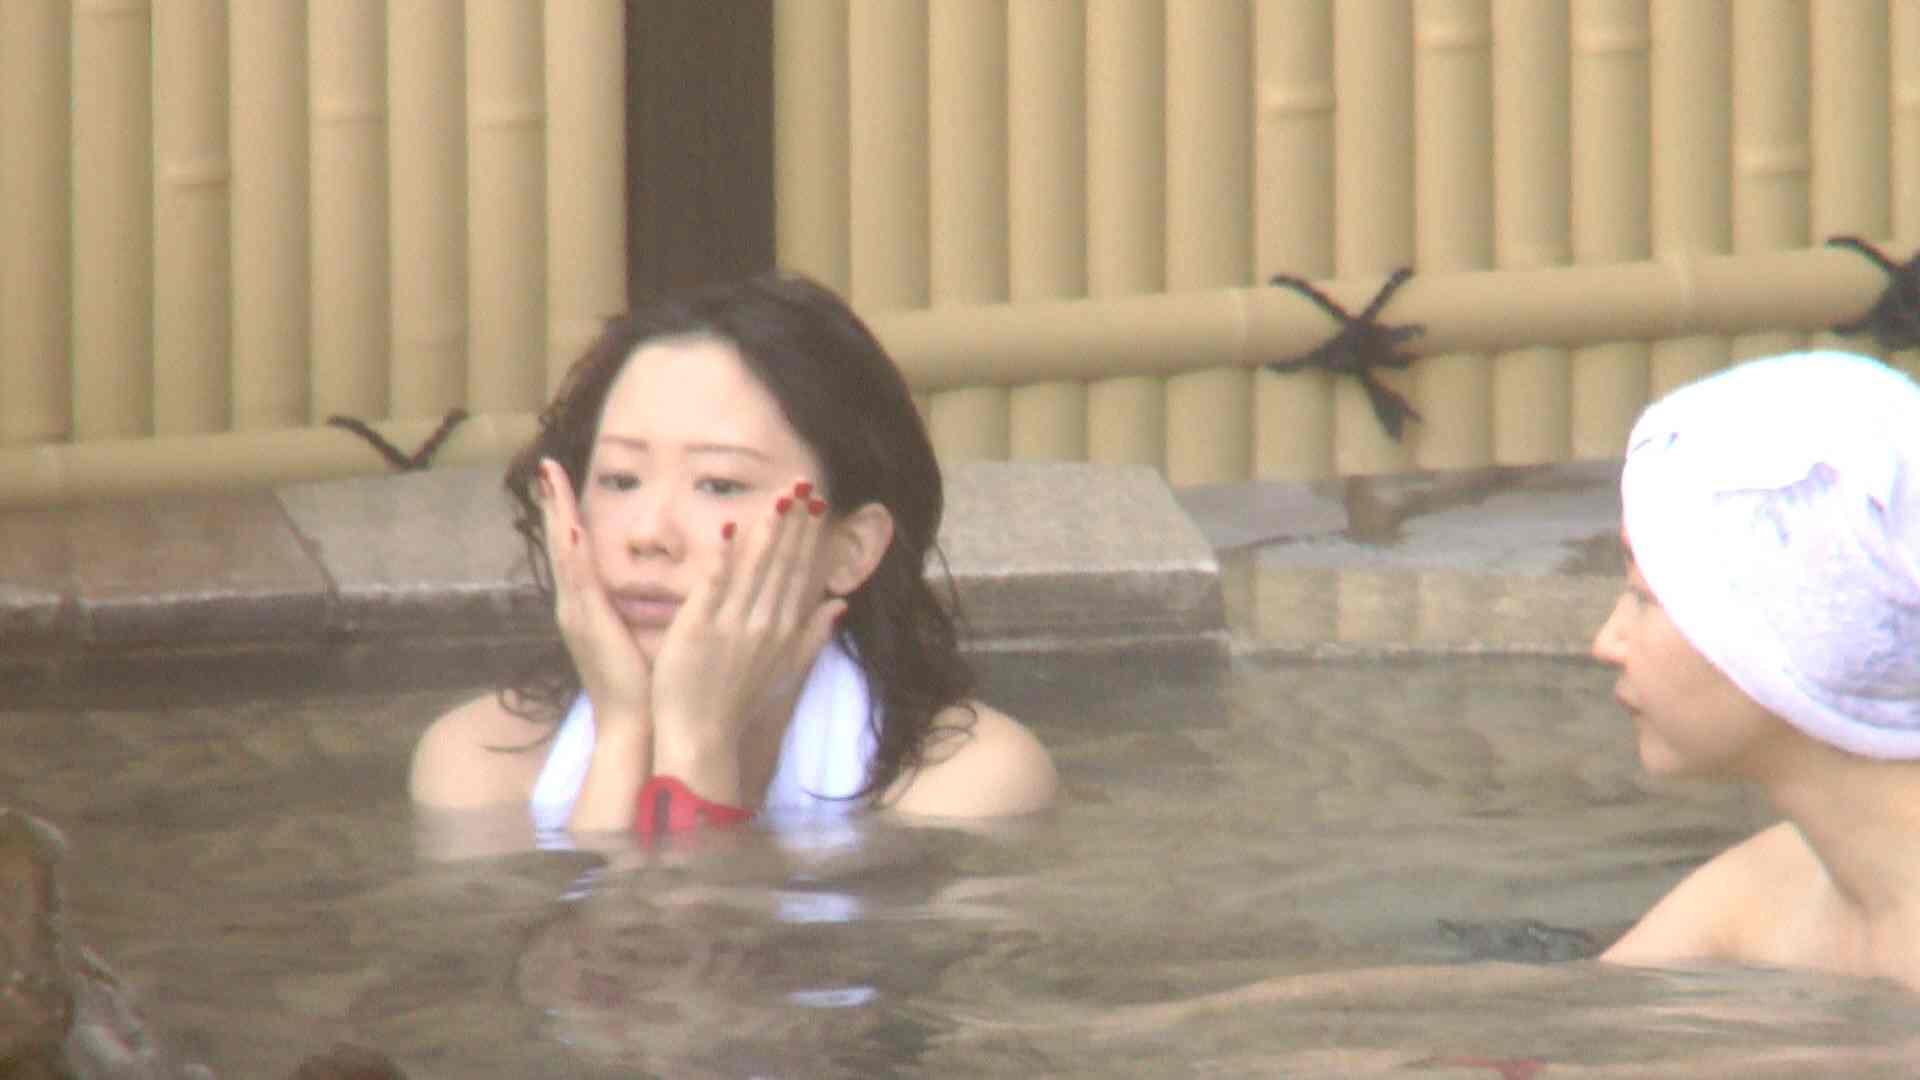 Aquaな露天風呂Vol.211 OLセックス 盗撮アダルト動画キャプチャ 68画像 2